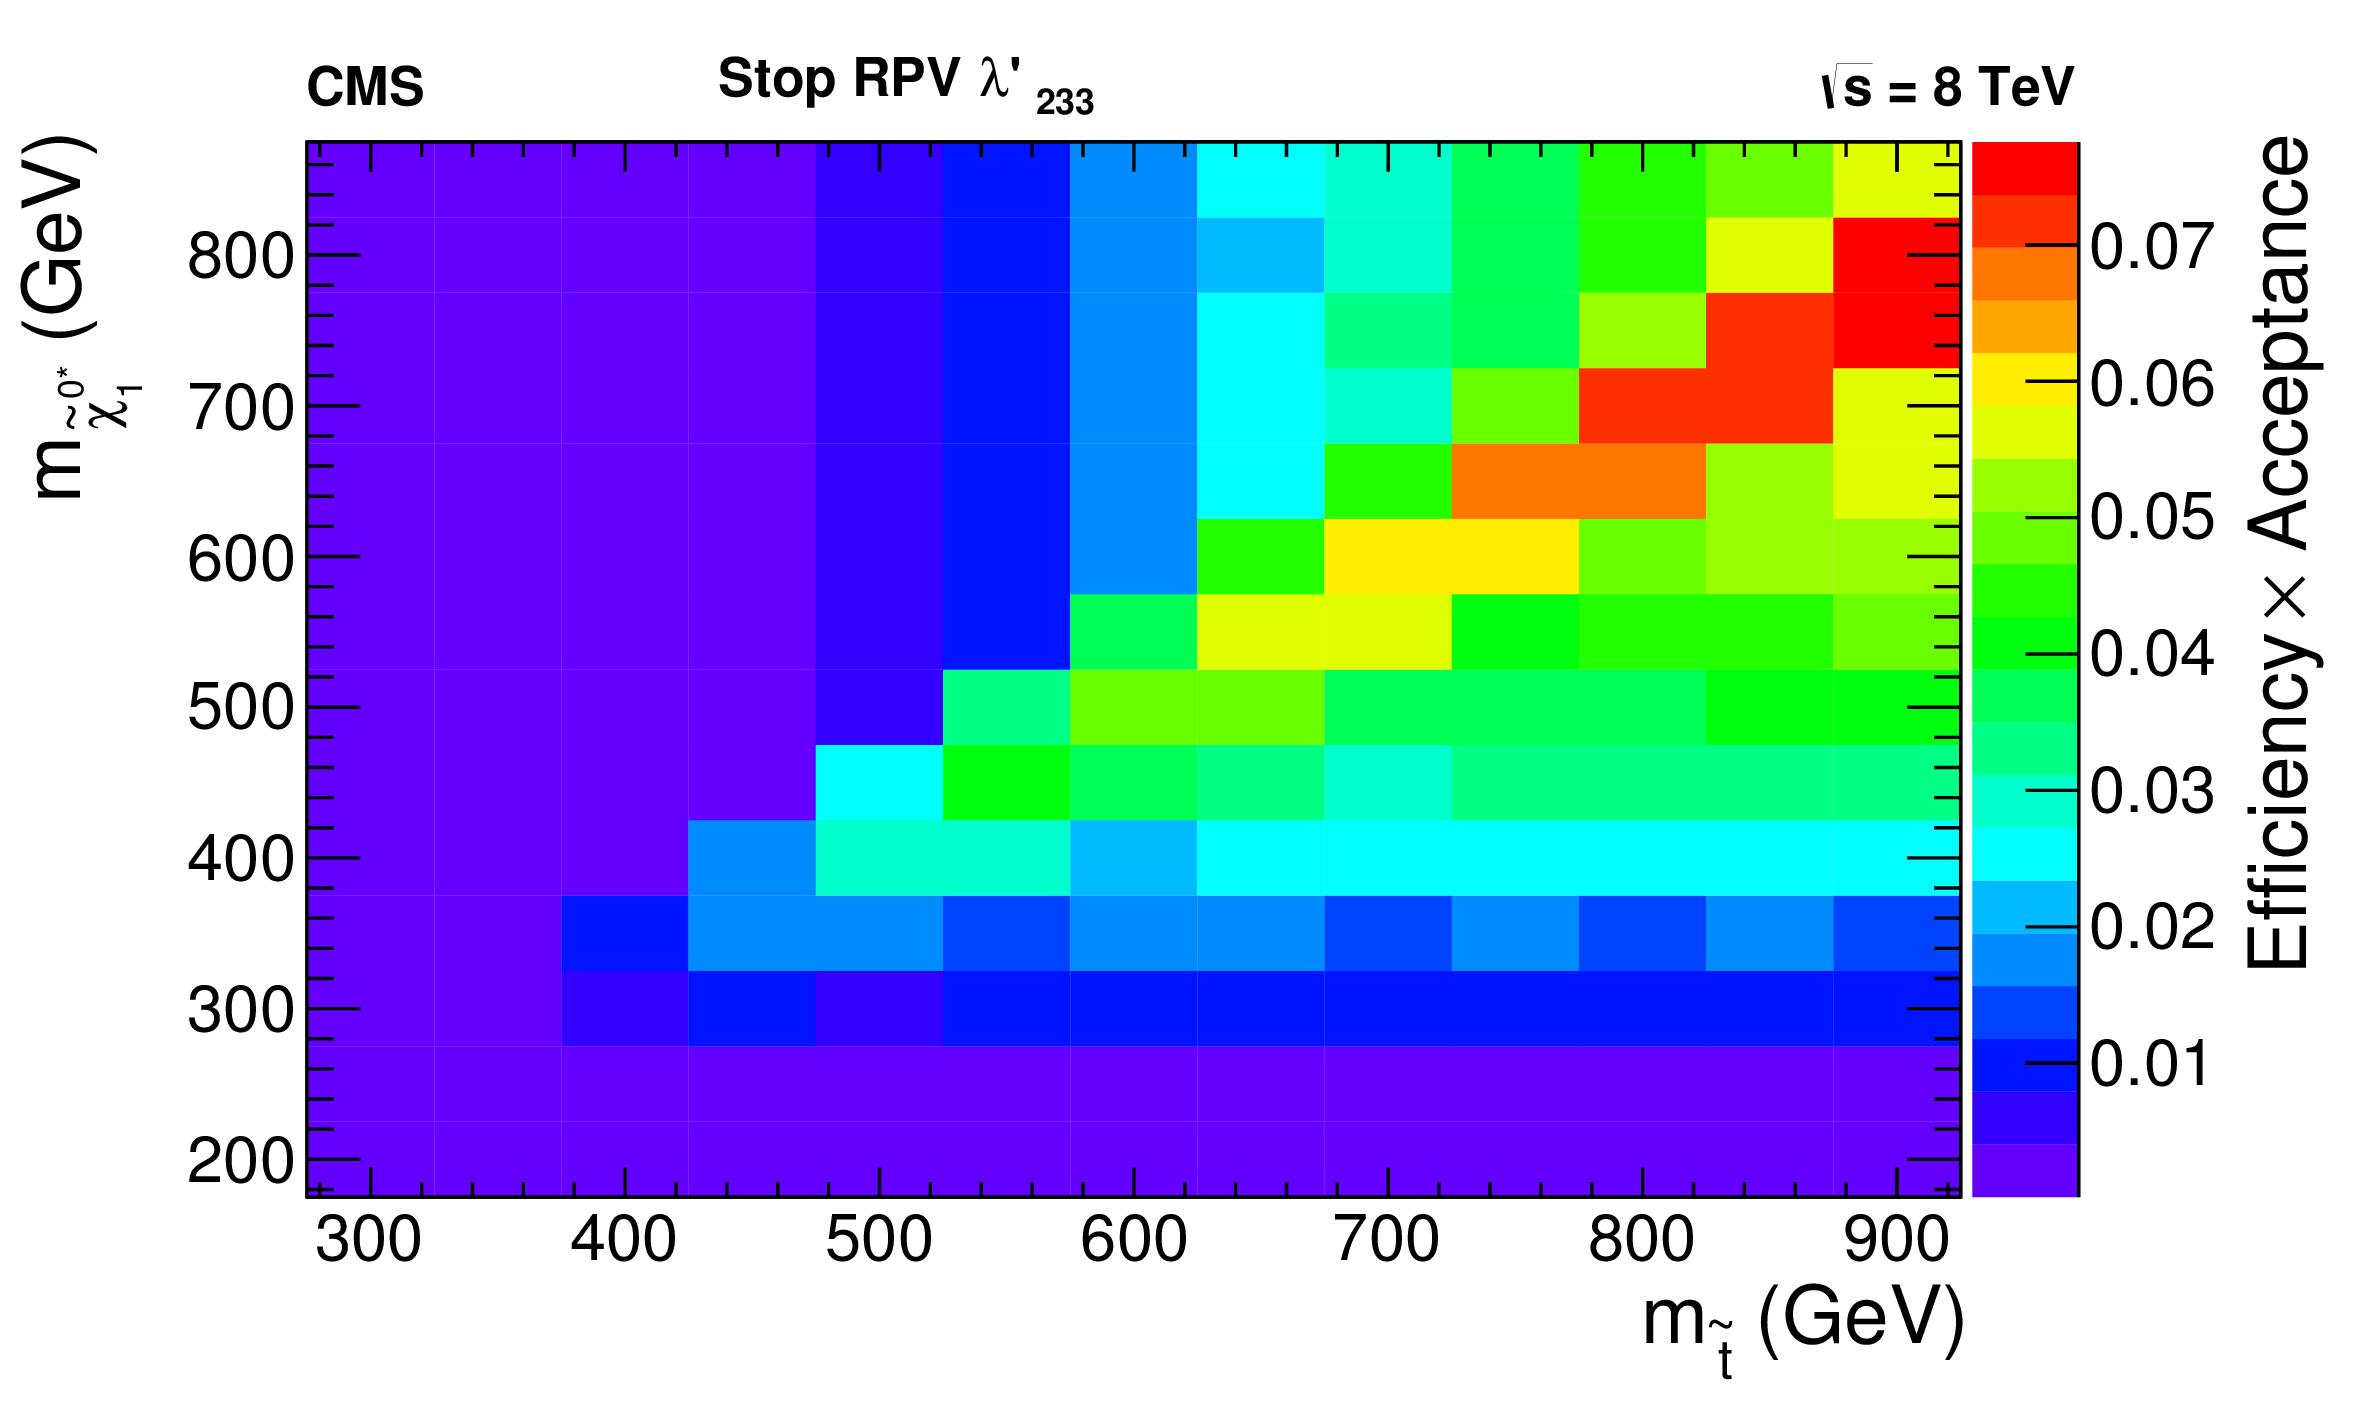 curve_StopRPV_LQD233_overlay_EffAcc3.png